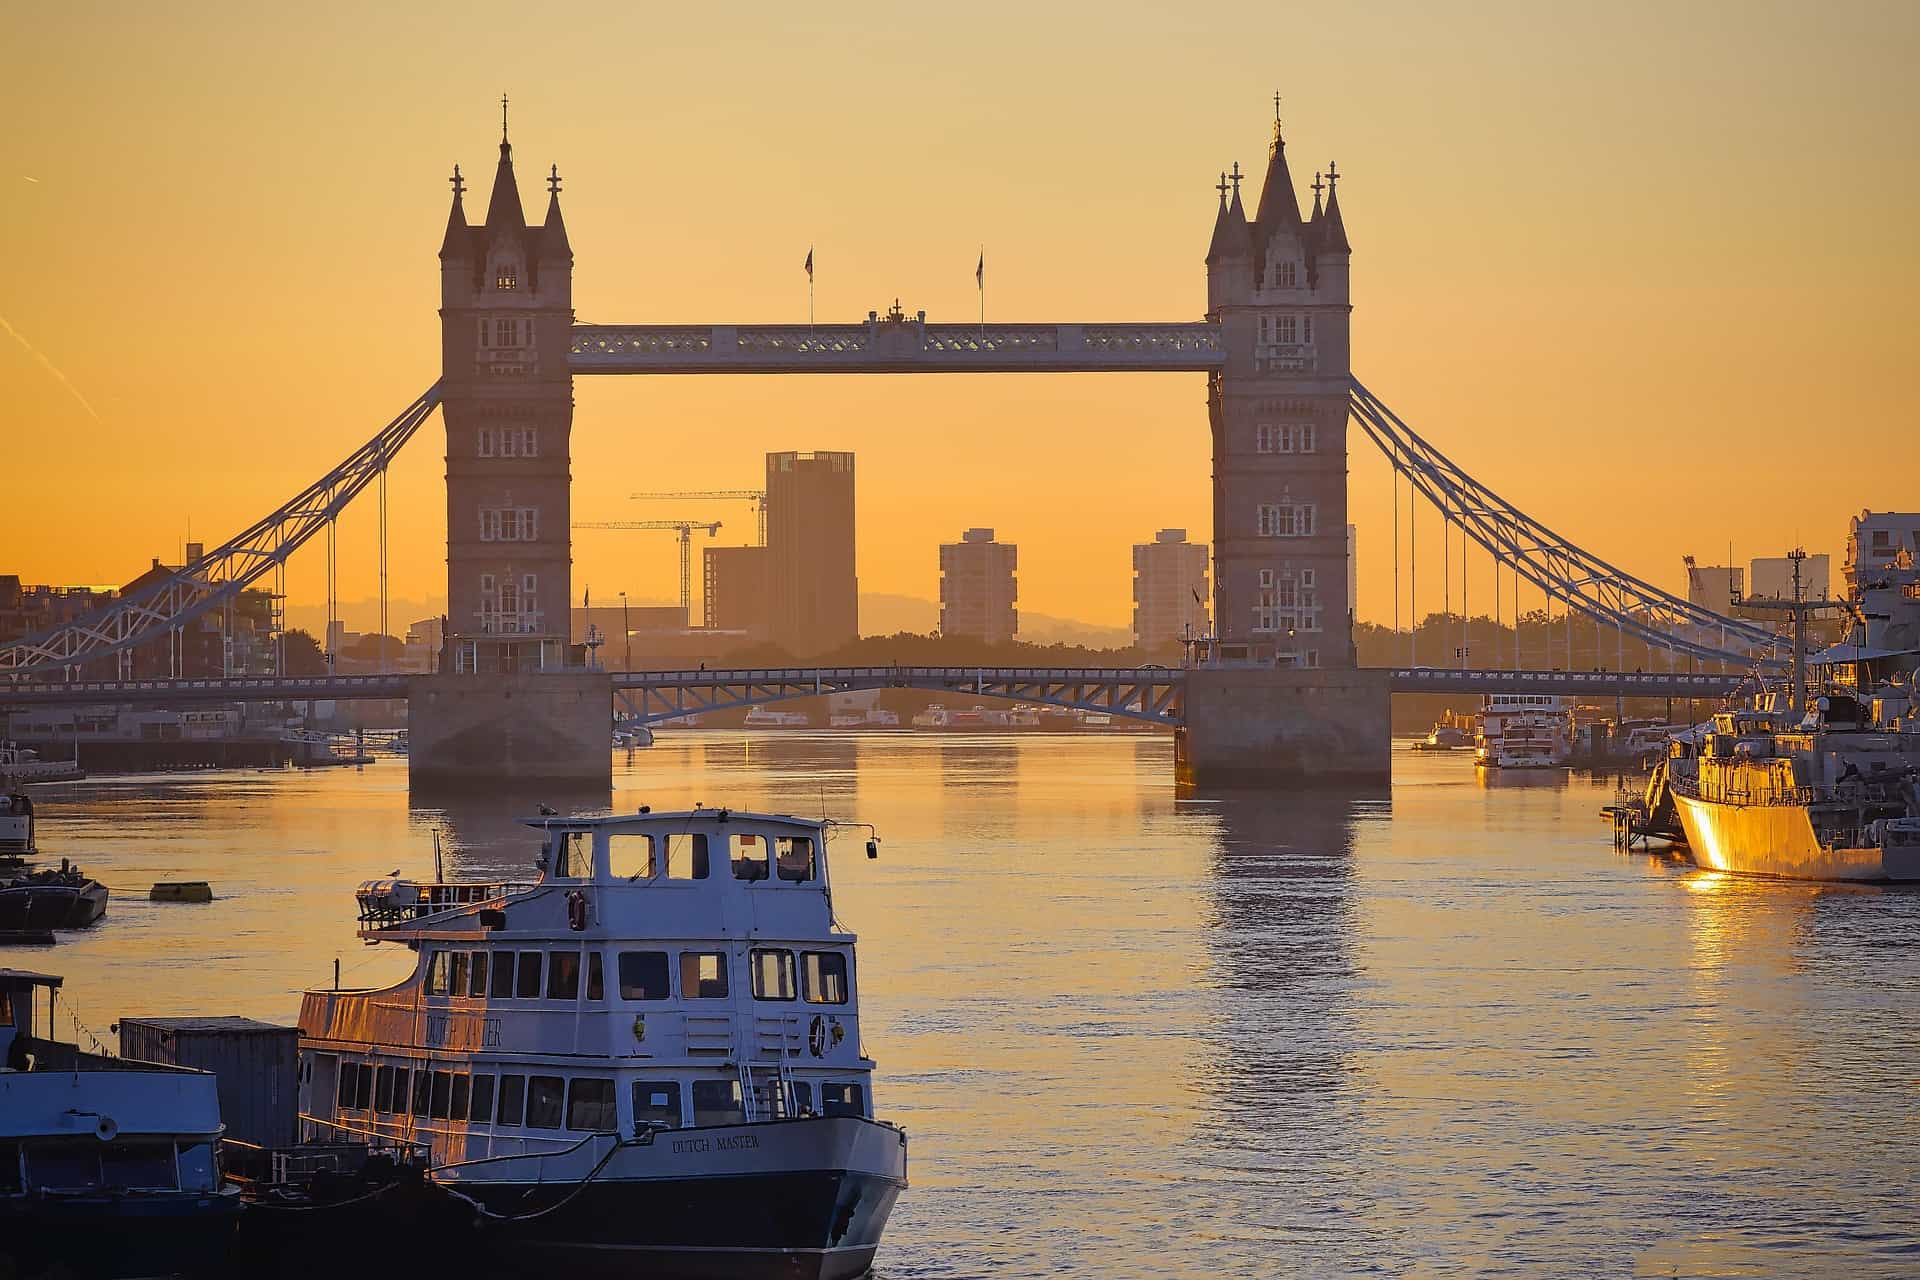 Themse Flusskreuzfahrt inklusive Dinner nur 92,49€ London